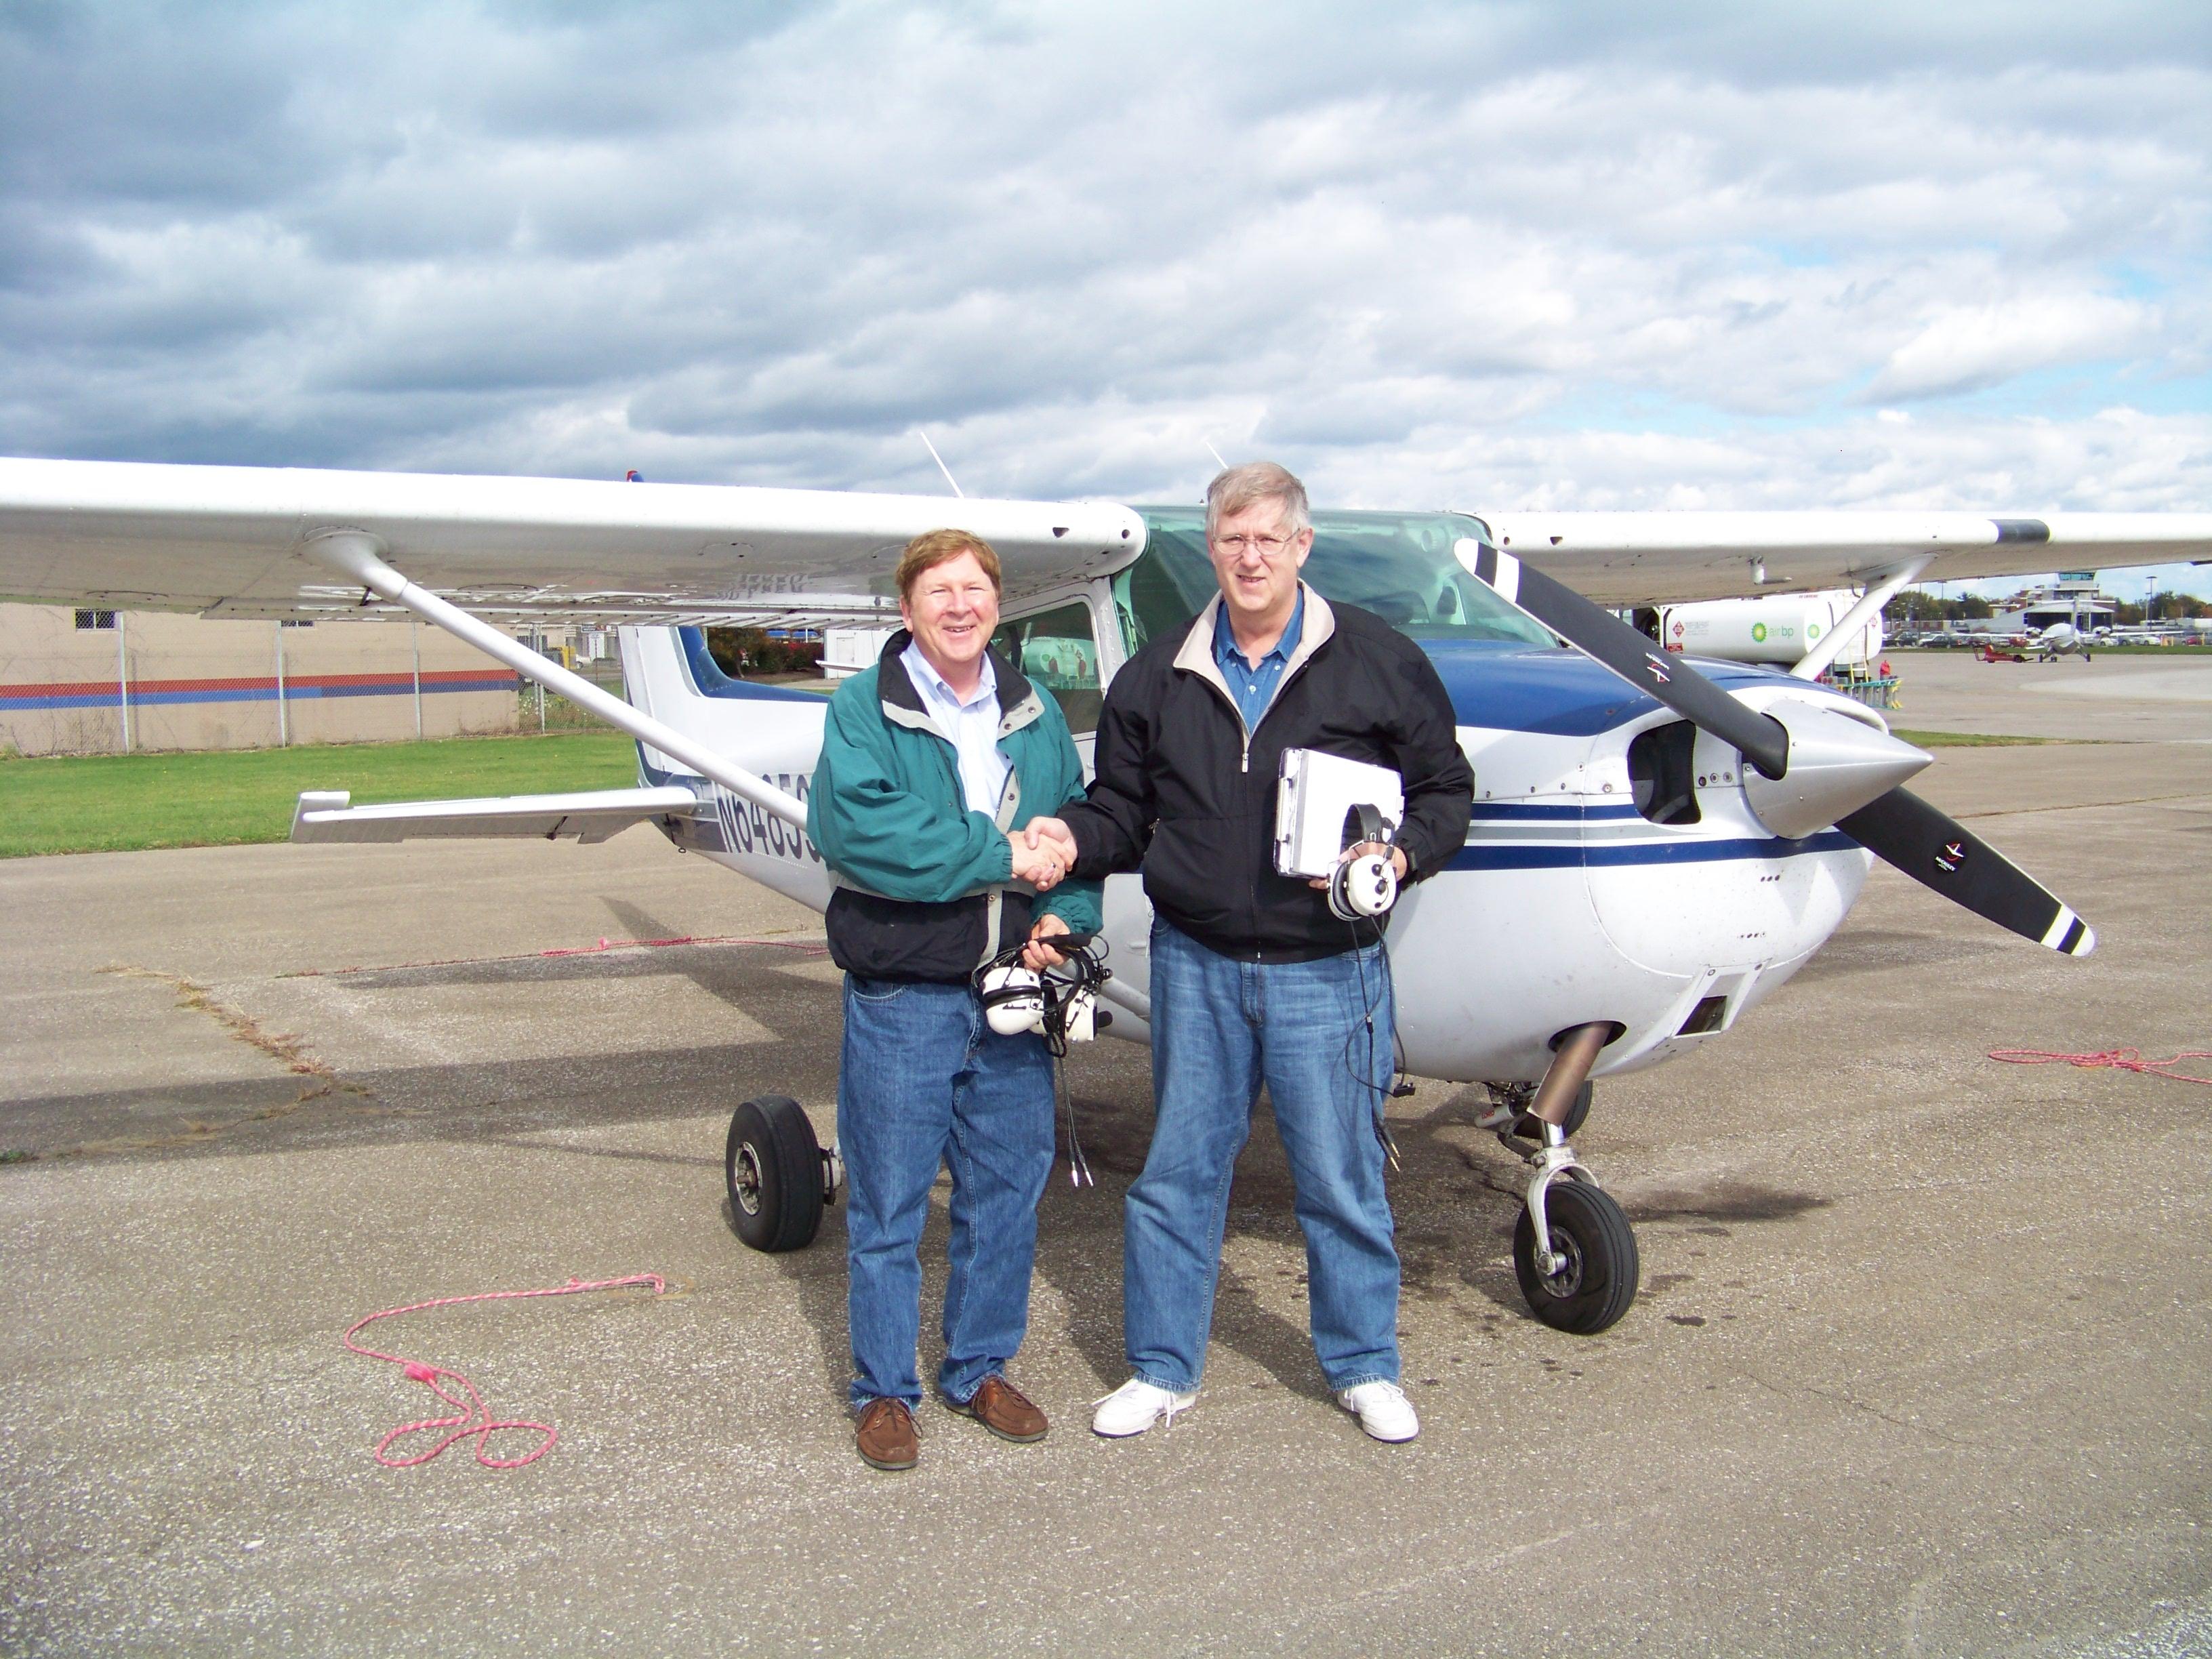 AJ, Wayne and a Cessna